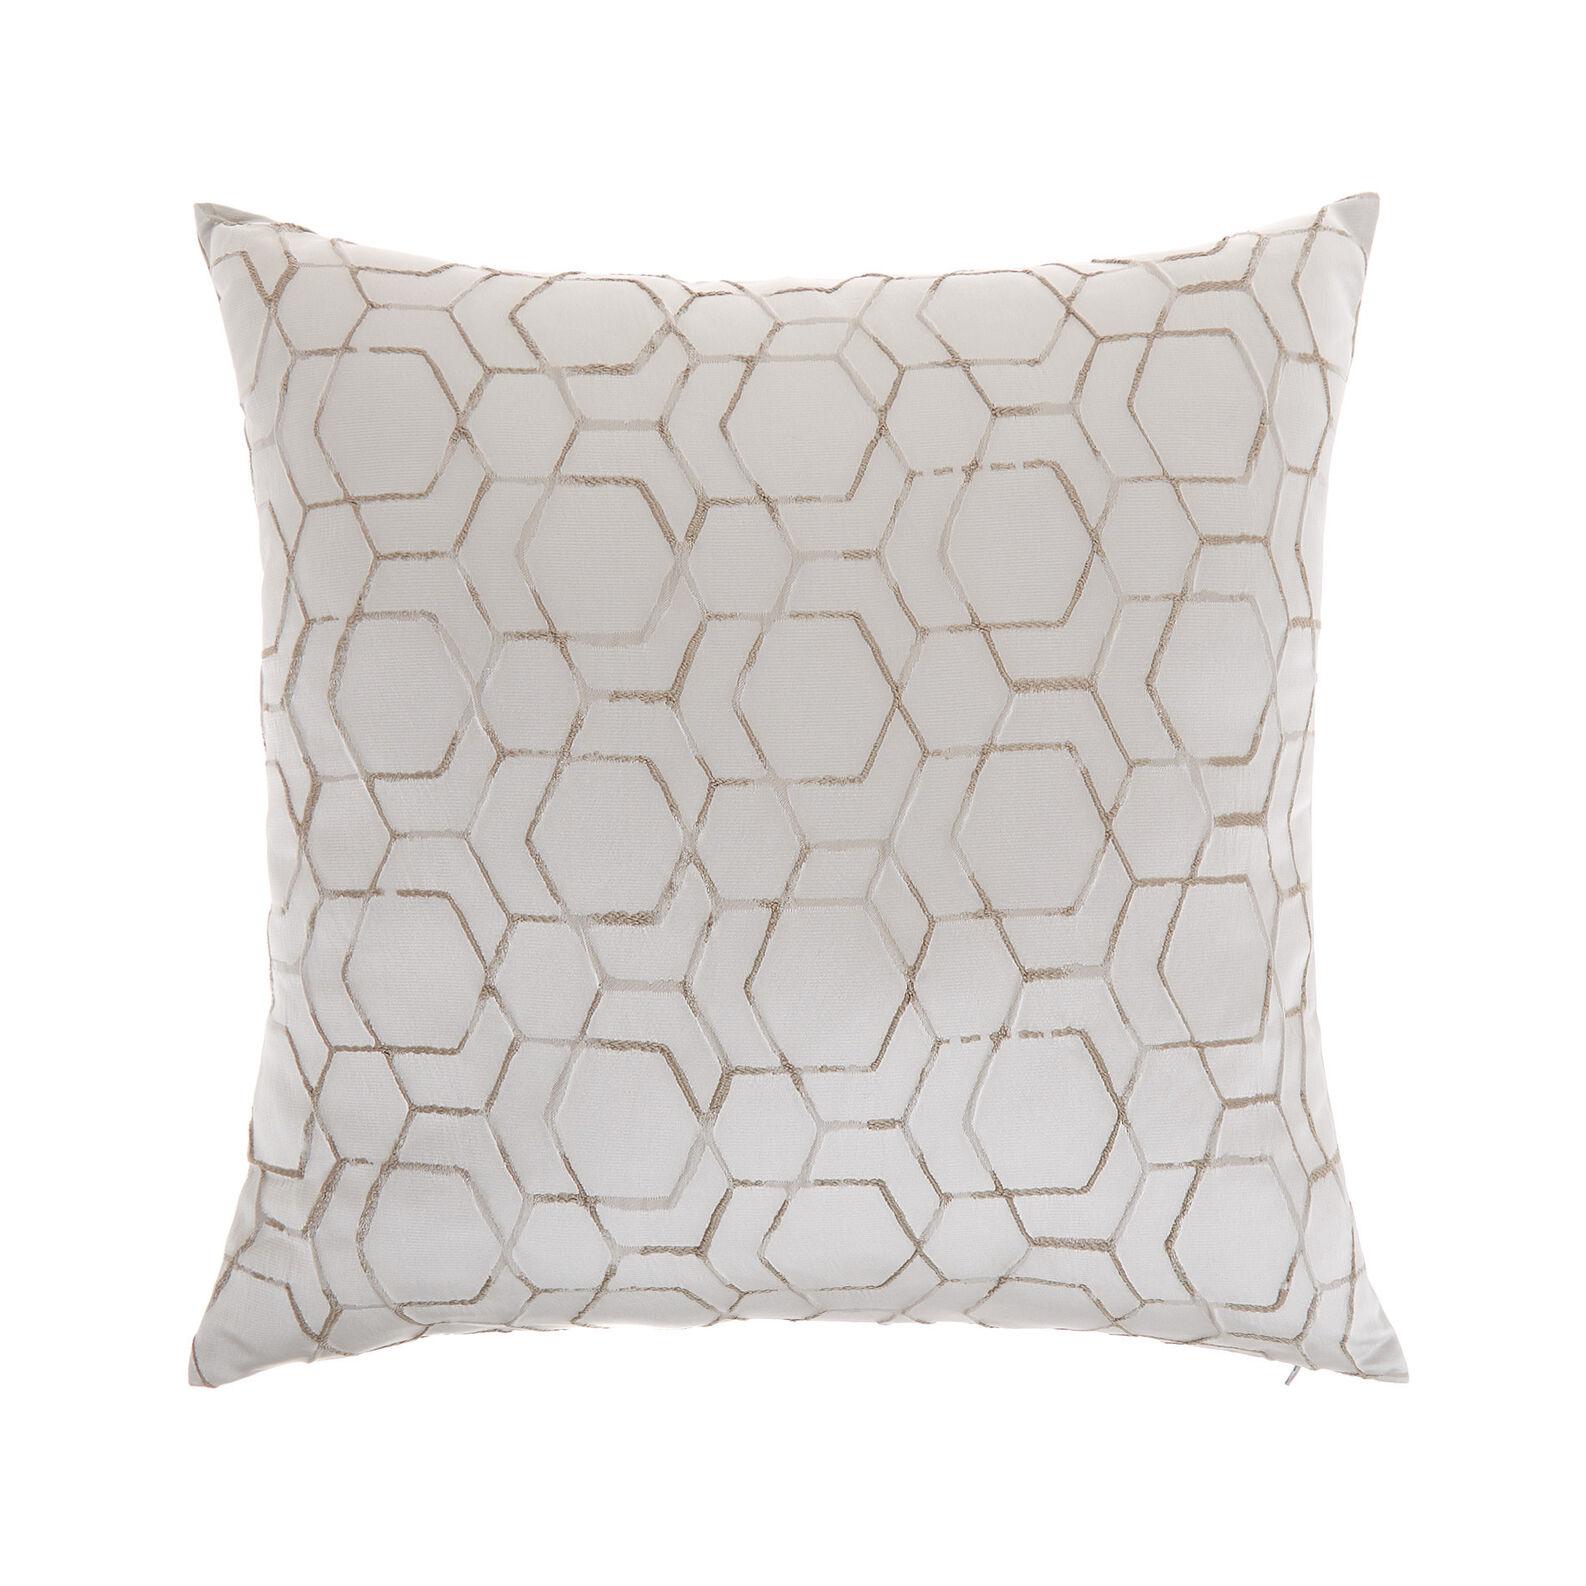 Cushion with geometric foil print 45x45cm